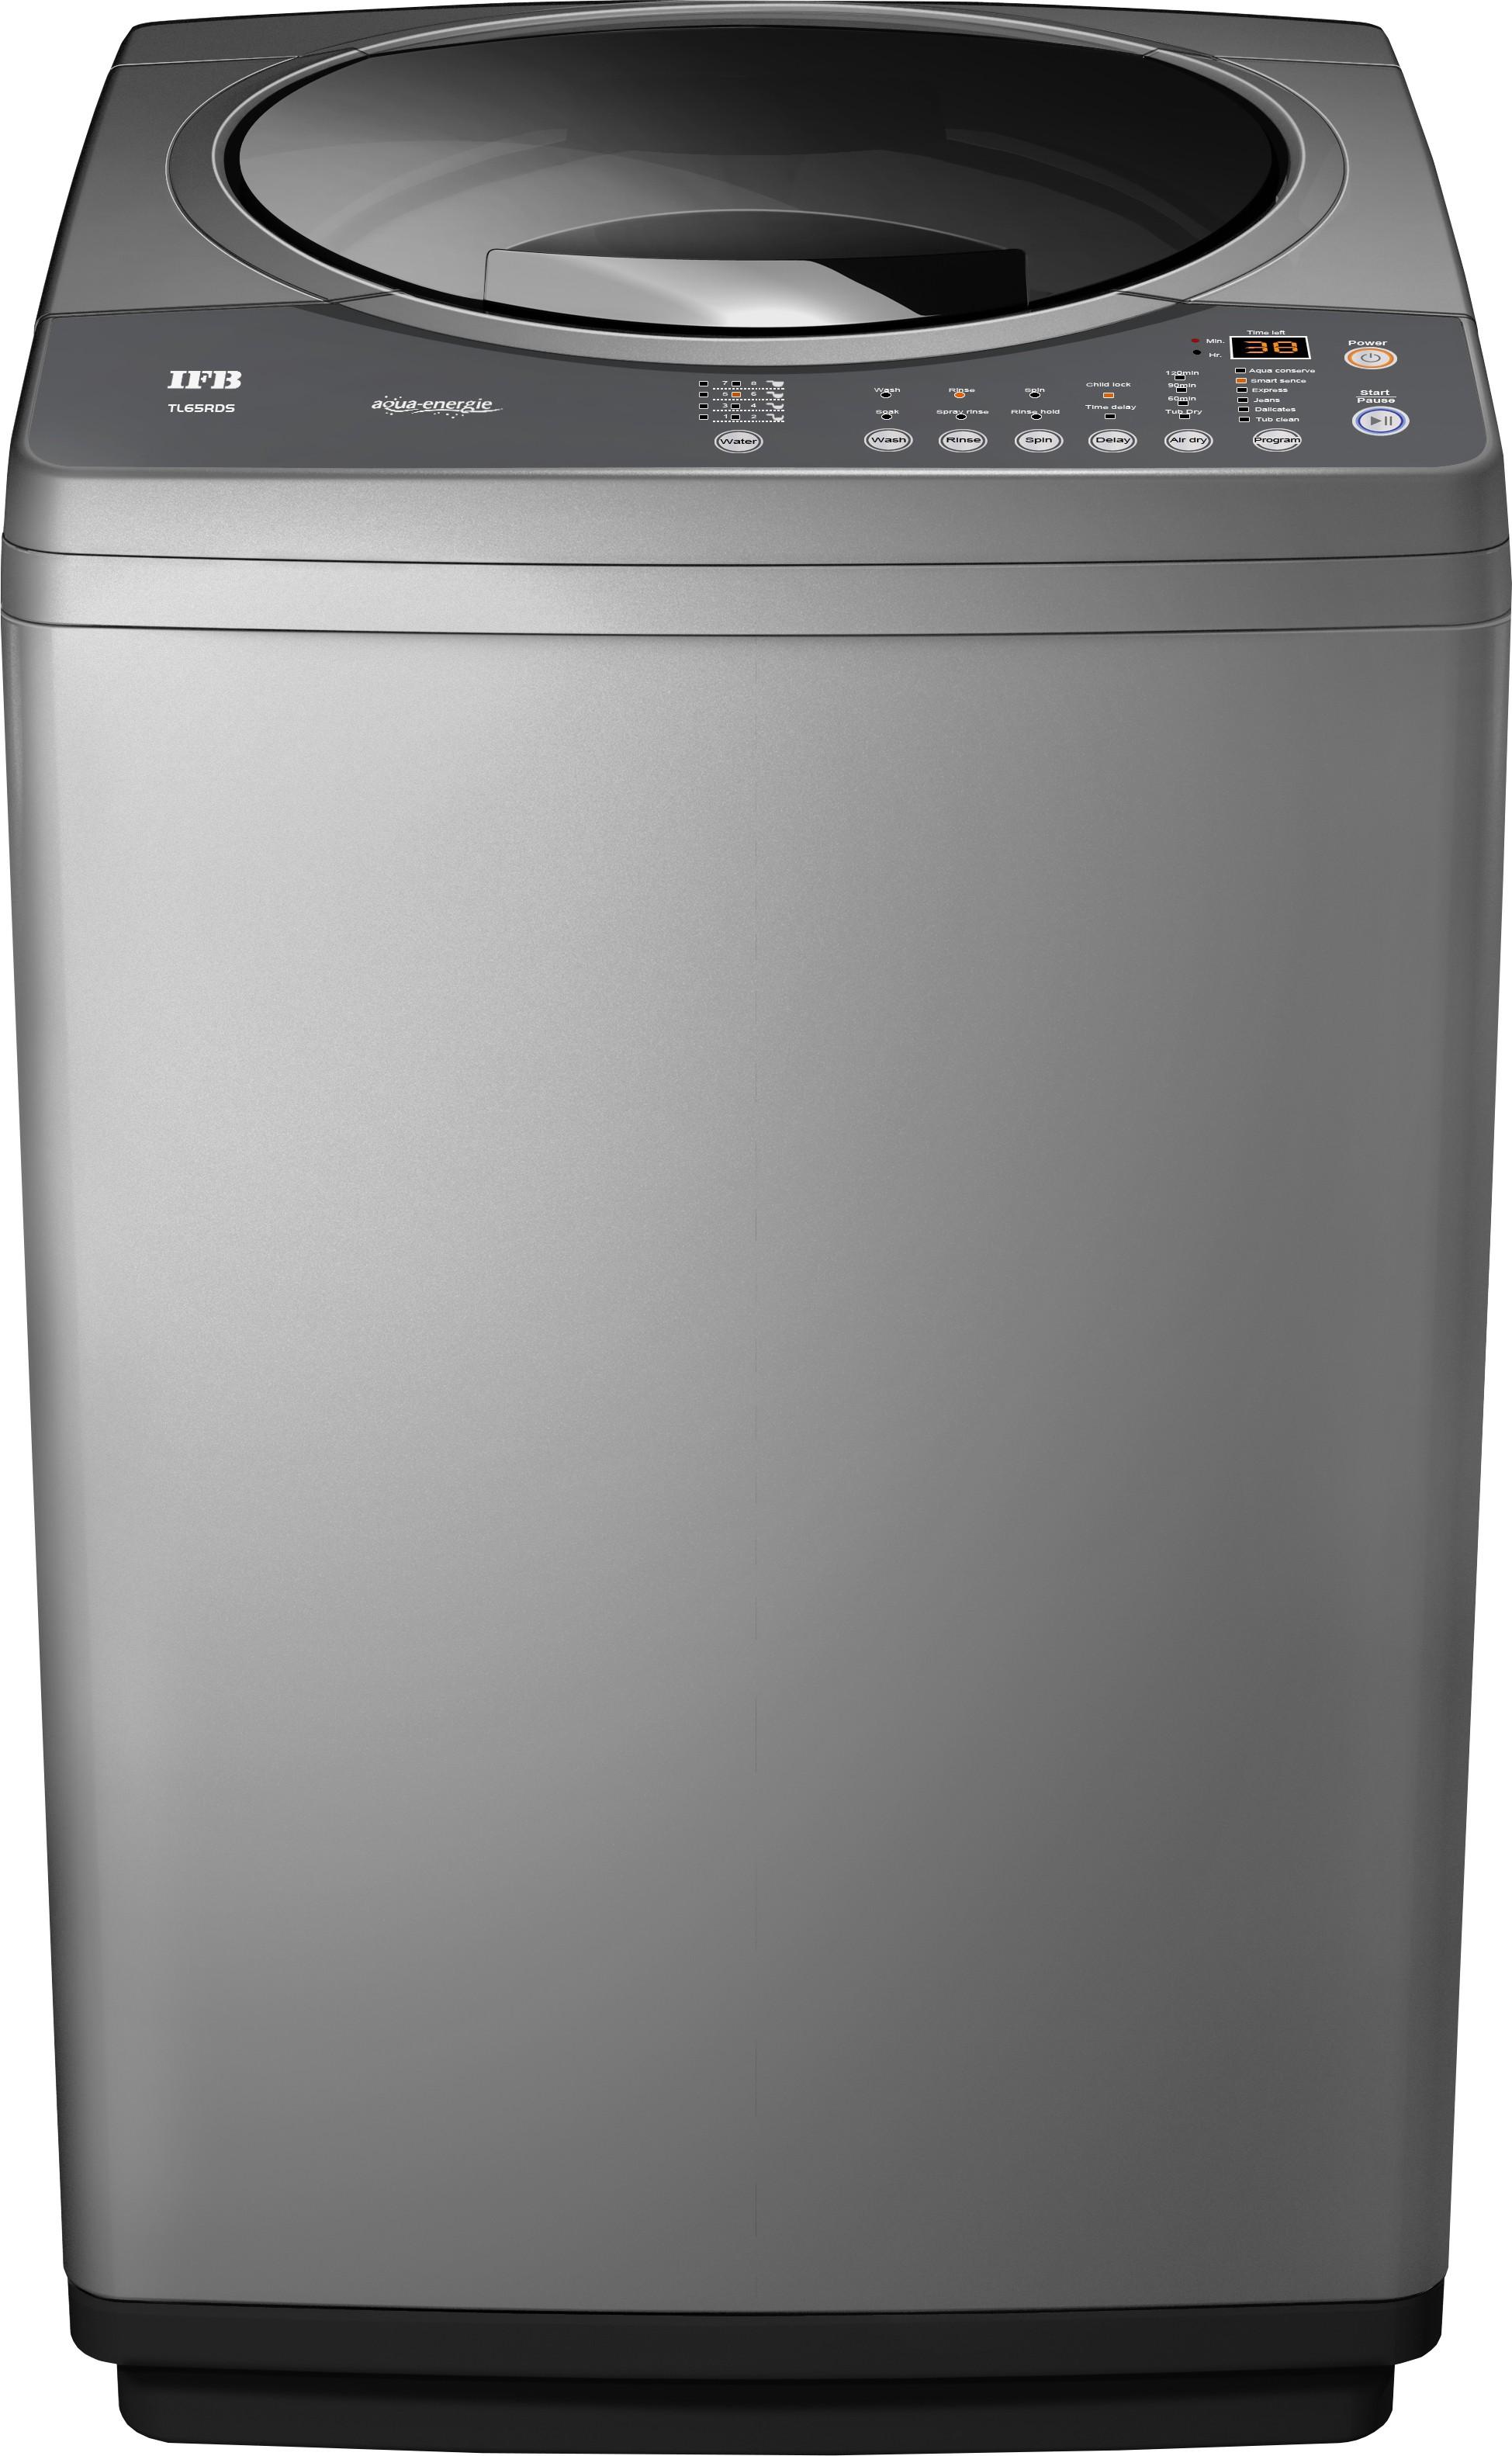 IFB TL 65RDS AQUA 6.5KG Fully Automatic Top Load Washing Machine